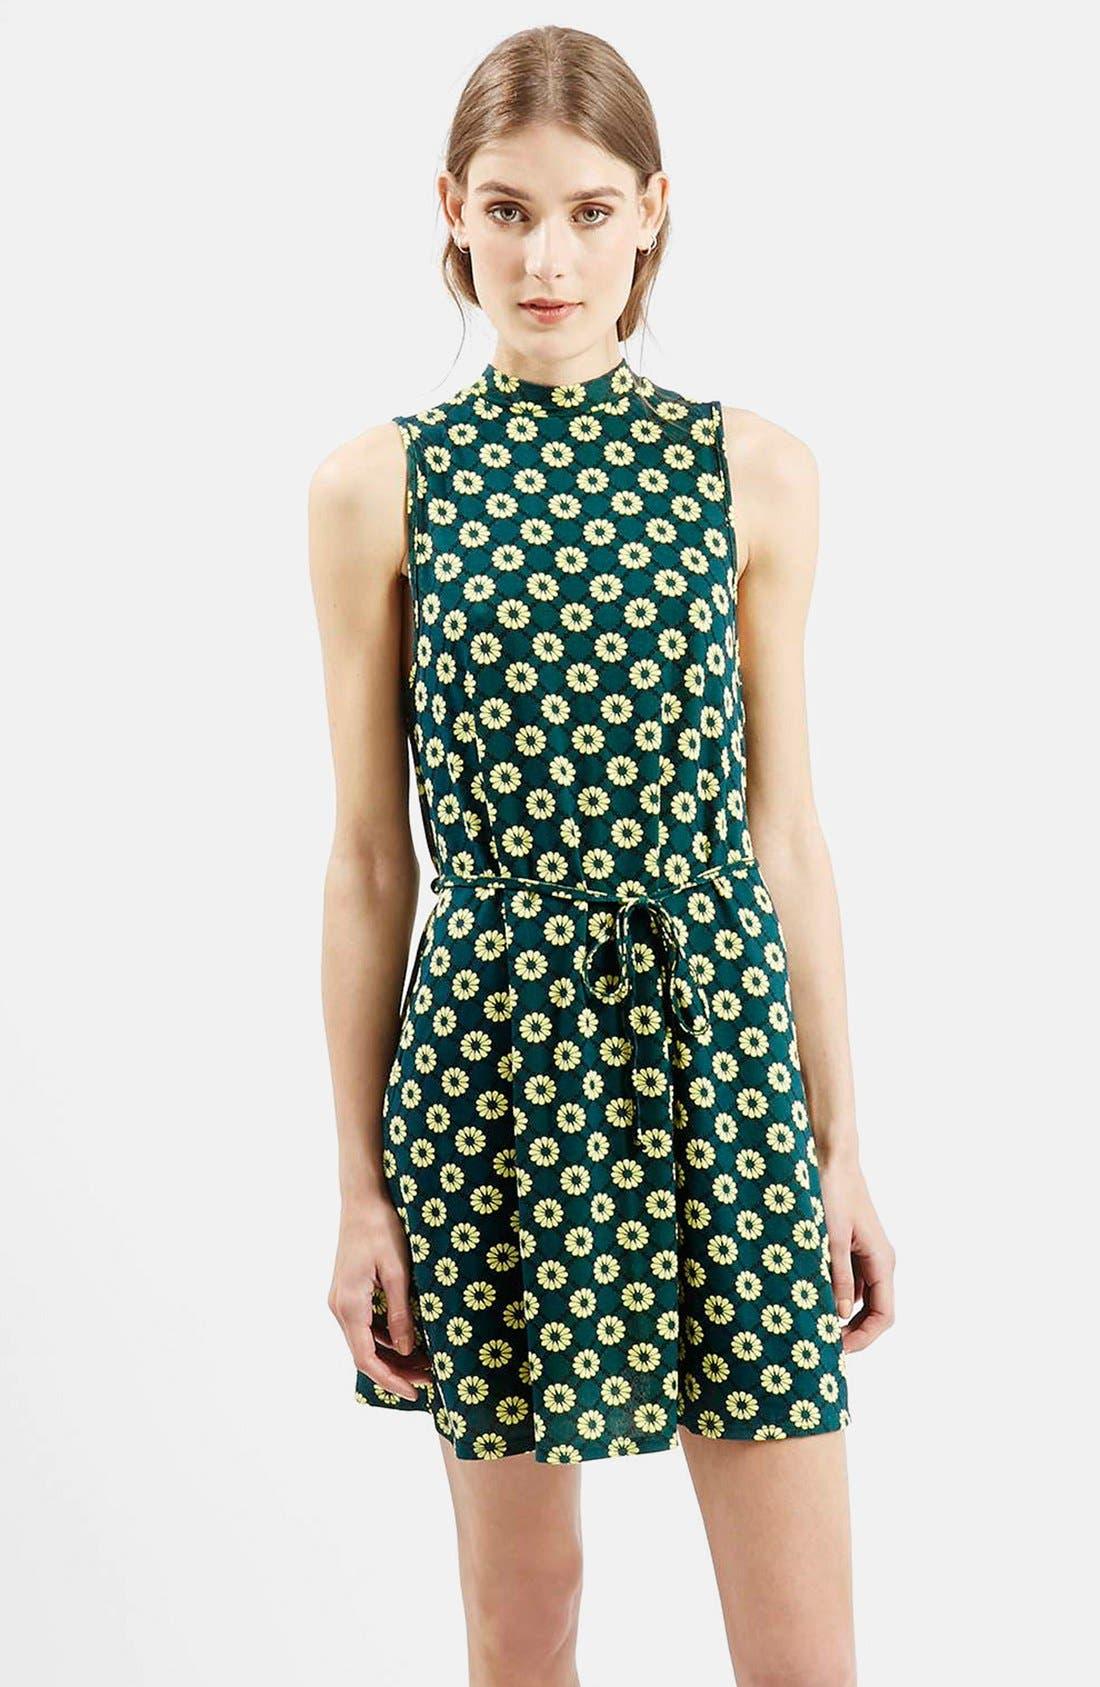 Main Image - Topshop 'Scandi' Flippy Sleeveless Dress